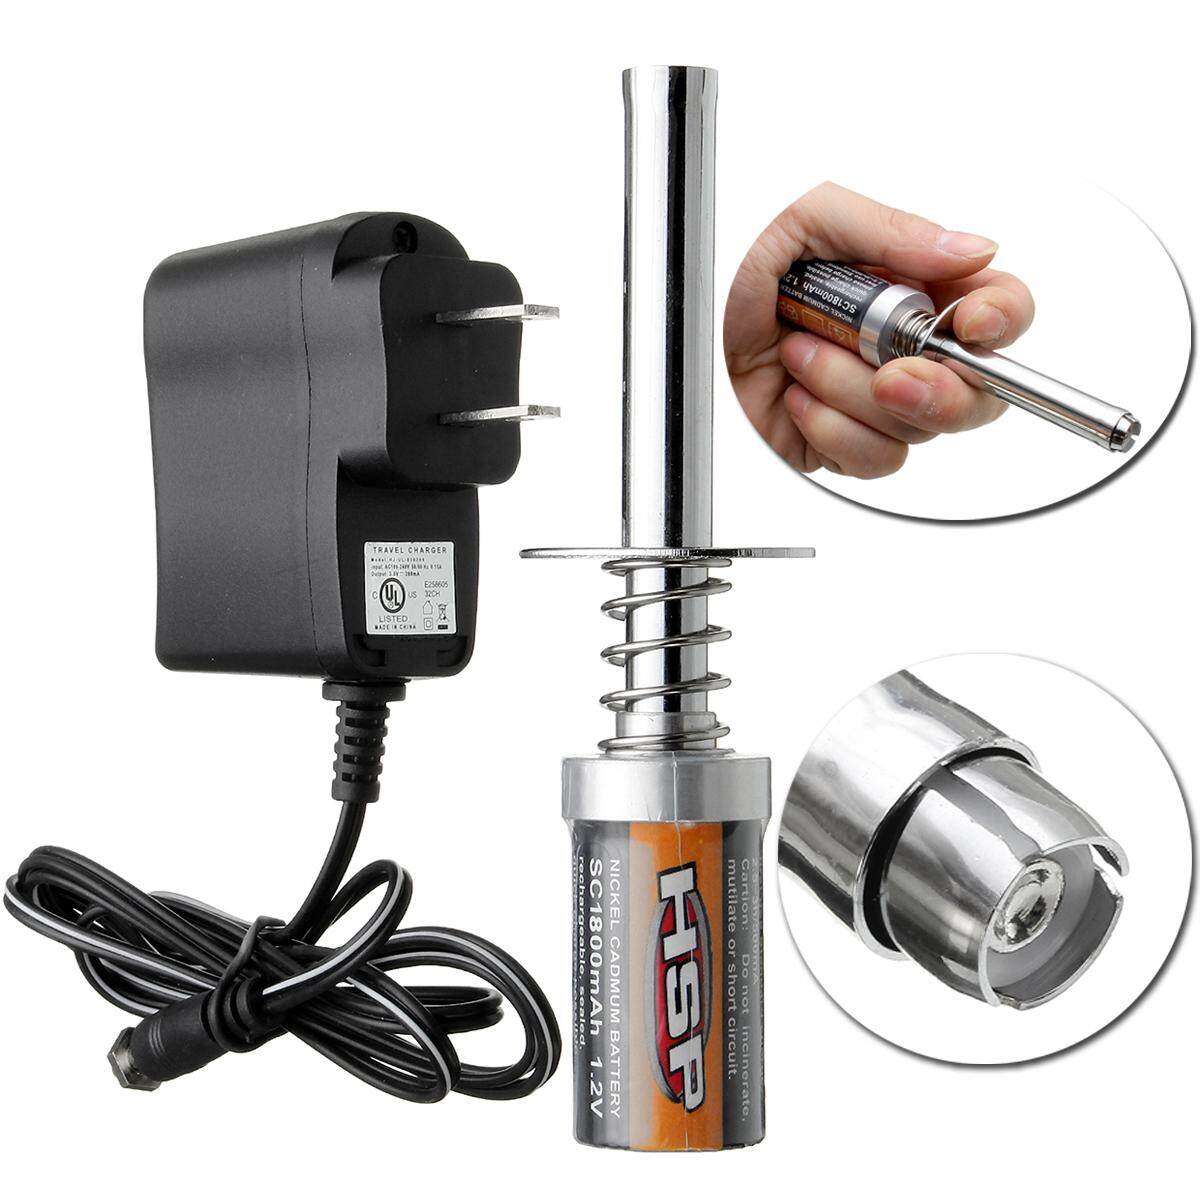 80101 Pro Glow Plug Igniter S tarter Per Truck Car HSP Char RC Plane ger Nitro